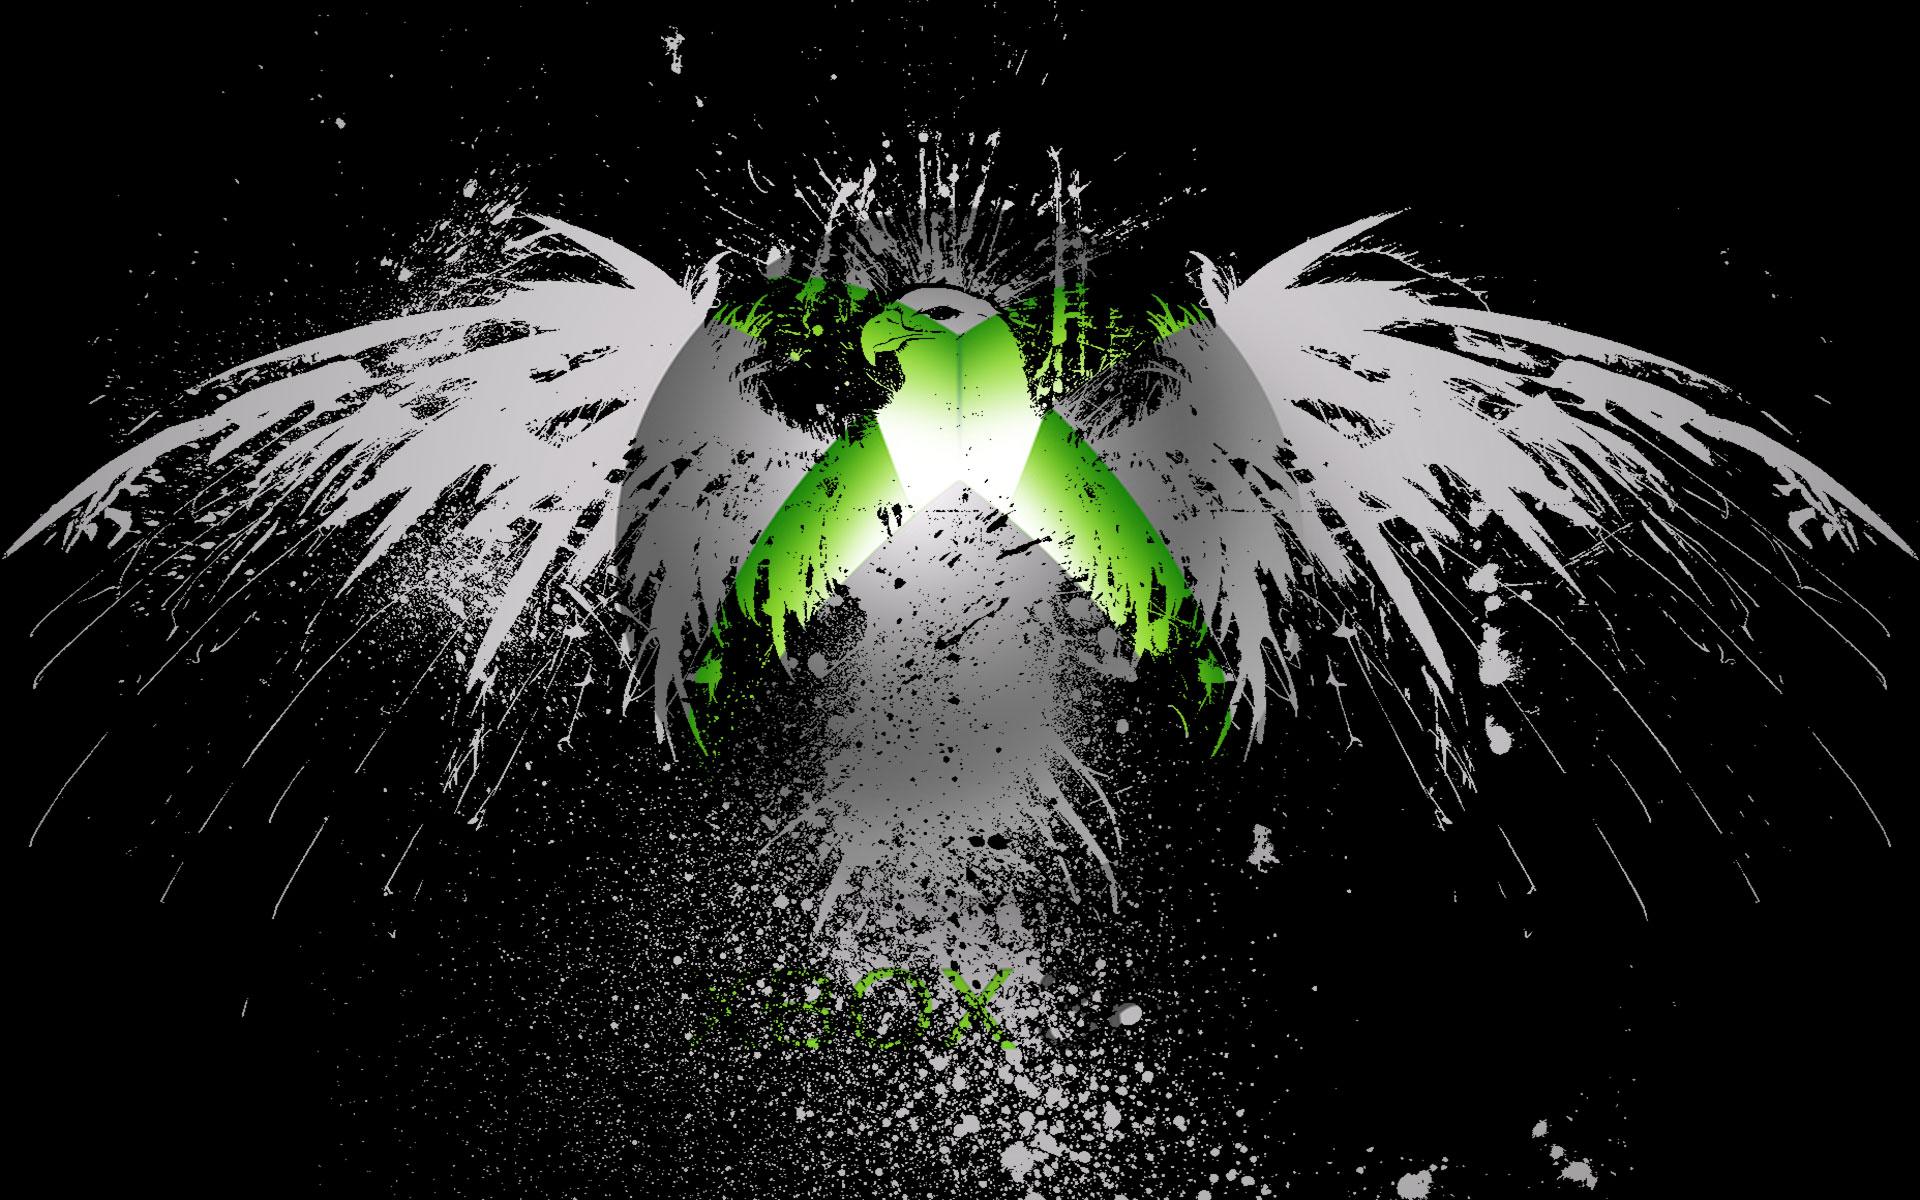 Xbox360 Wallpaper 1920x1200 Xbox360 1920x1200